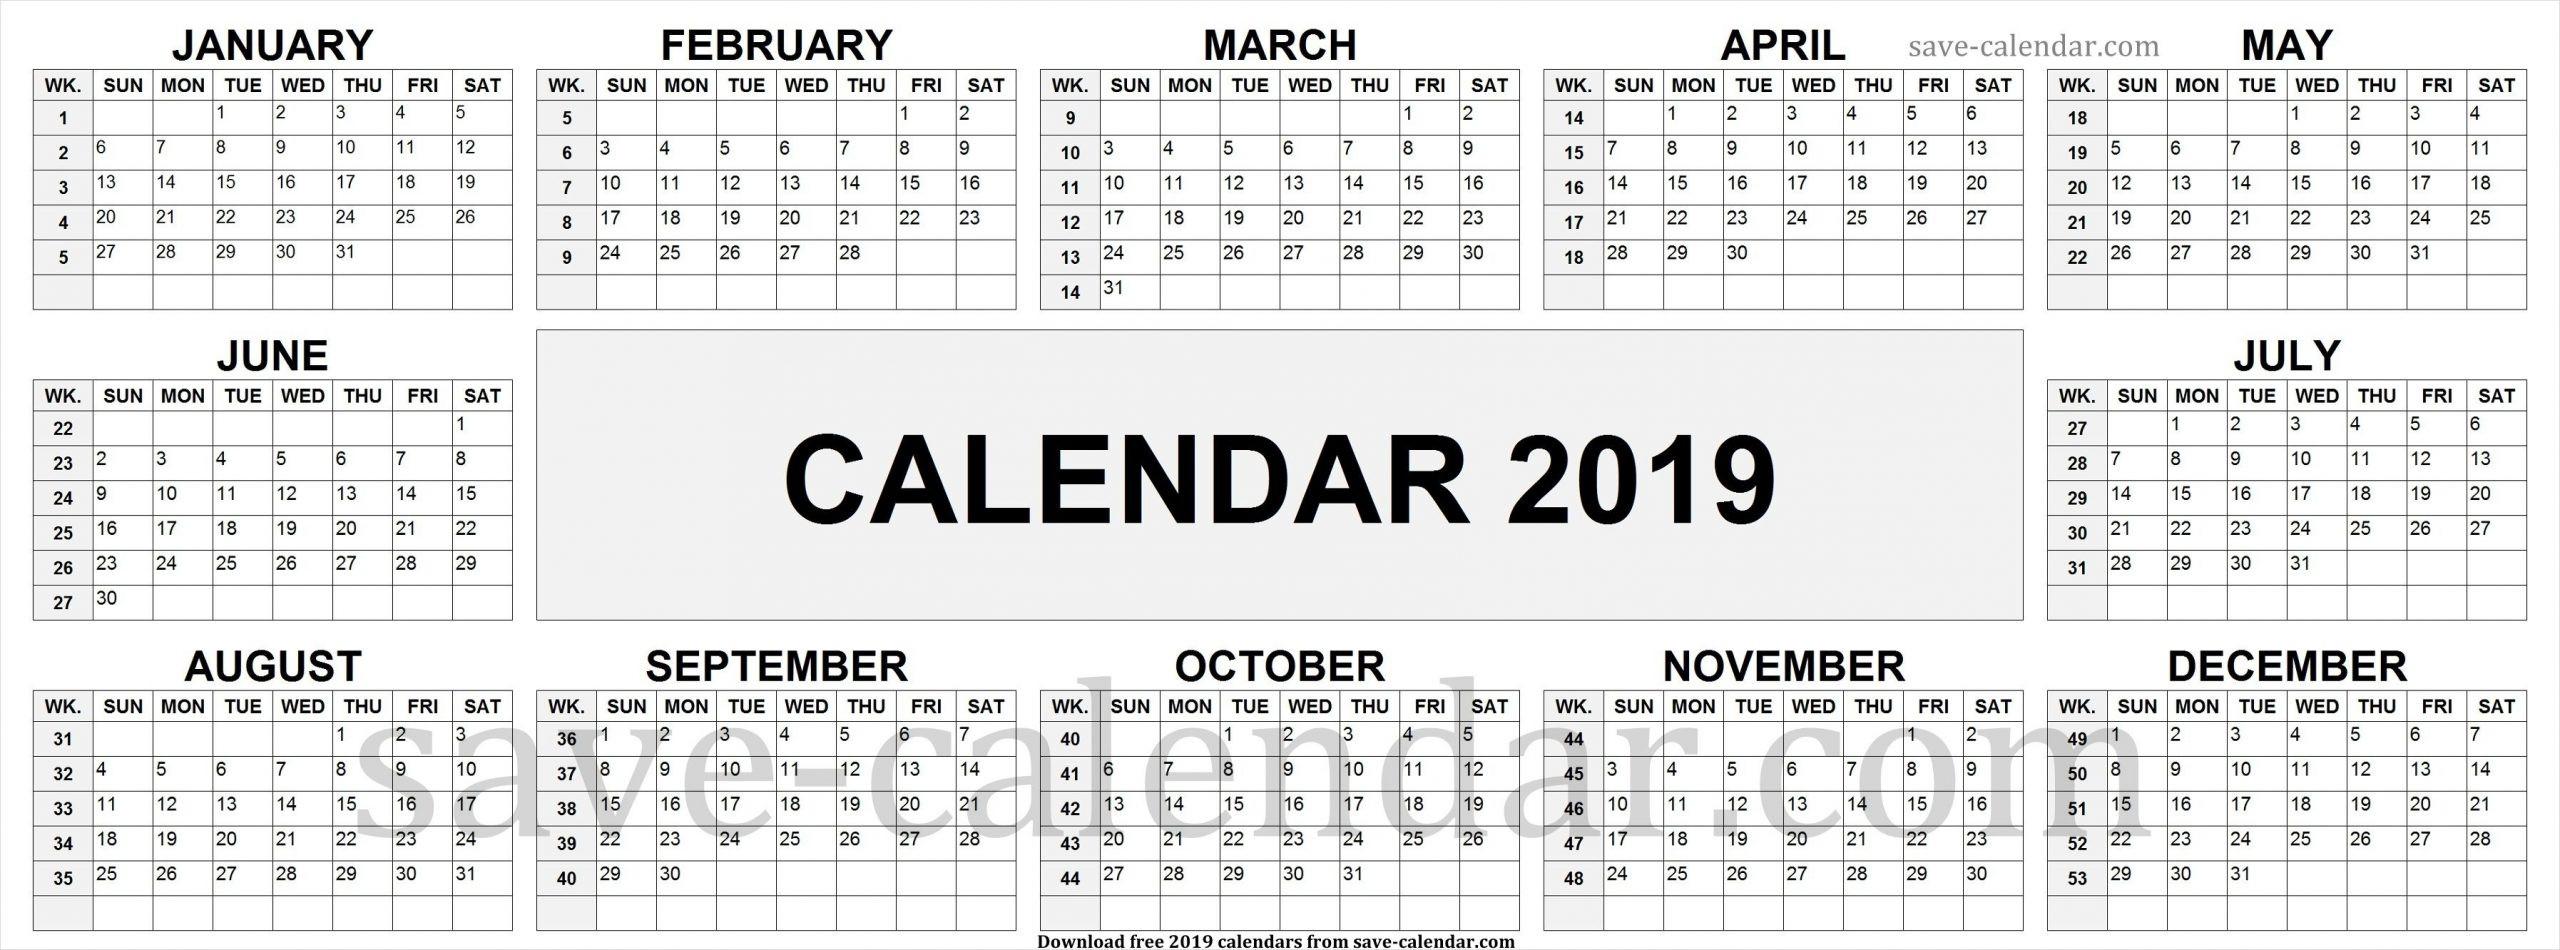 Depo Schedule For 2021   Calendar Printables Free Blank  Depo Provera Calendar 2021 Pdf